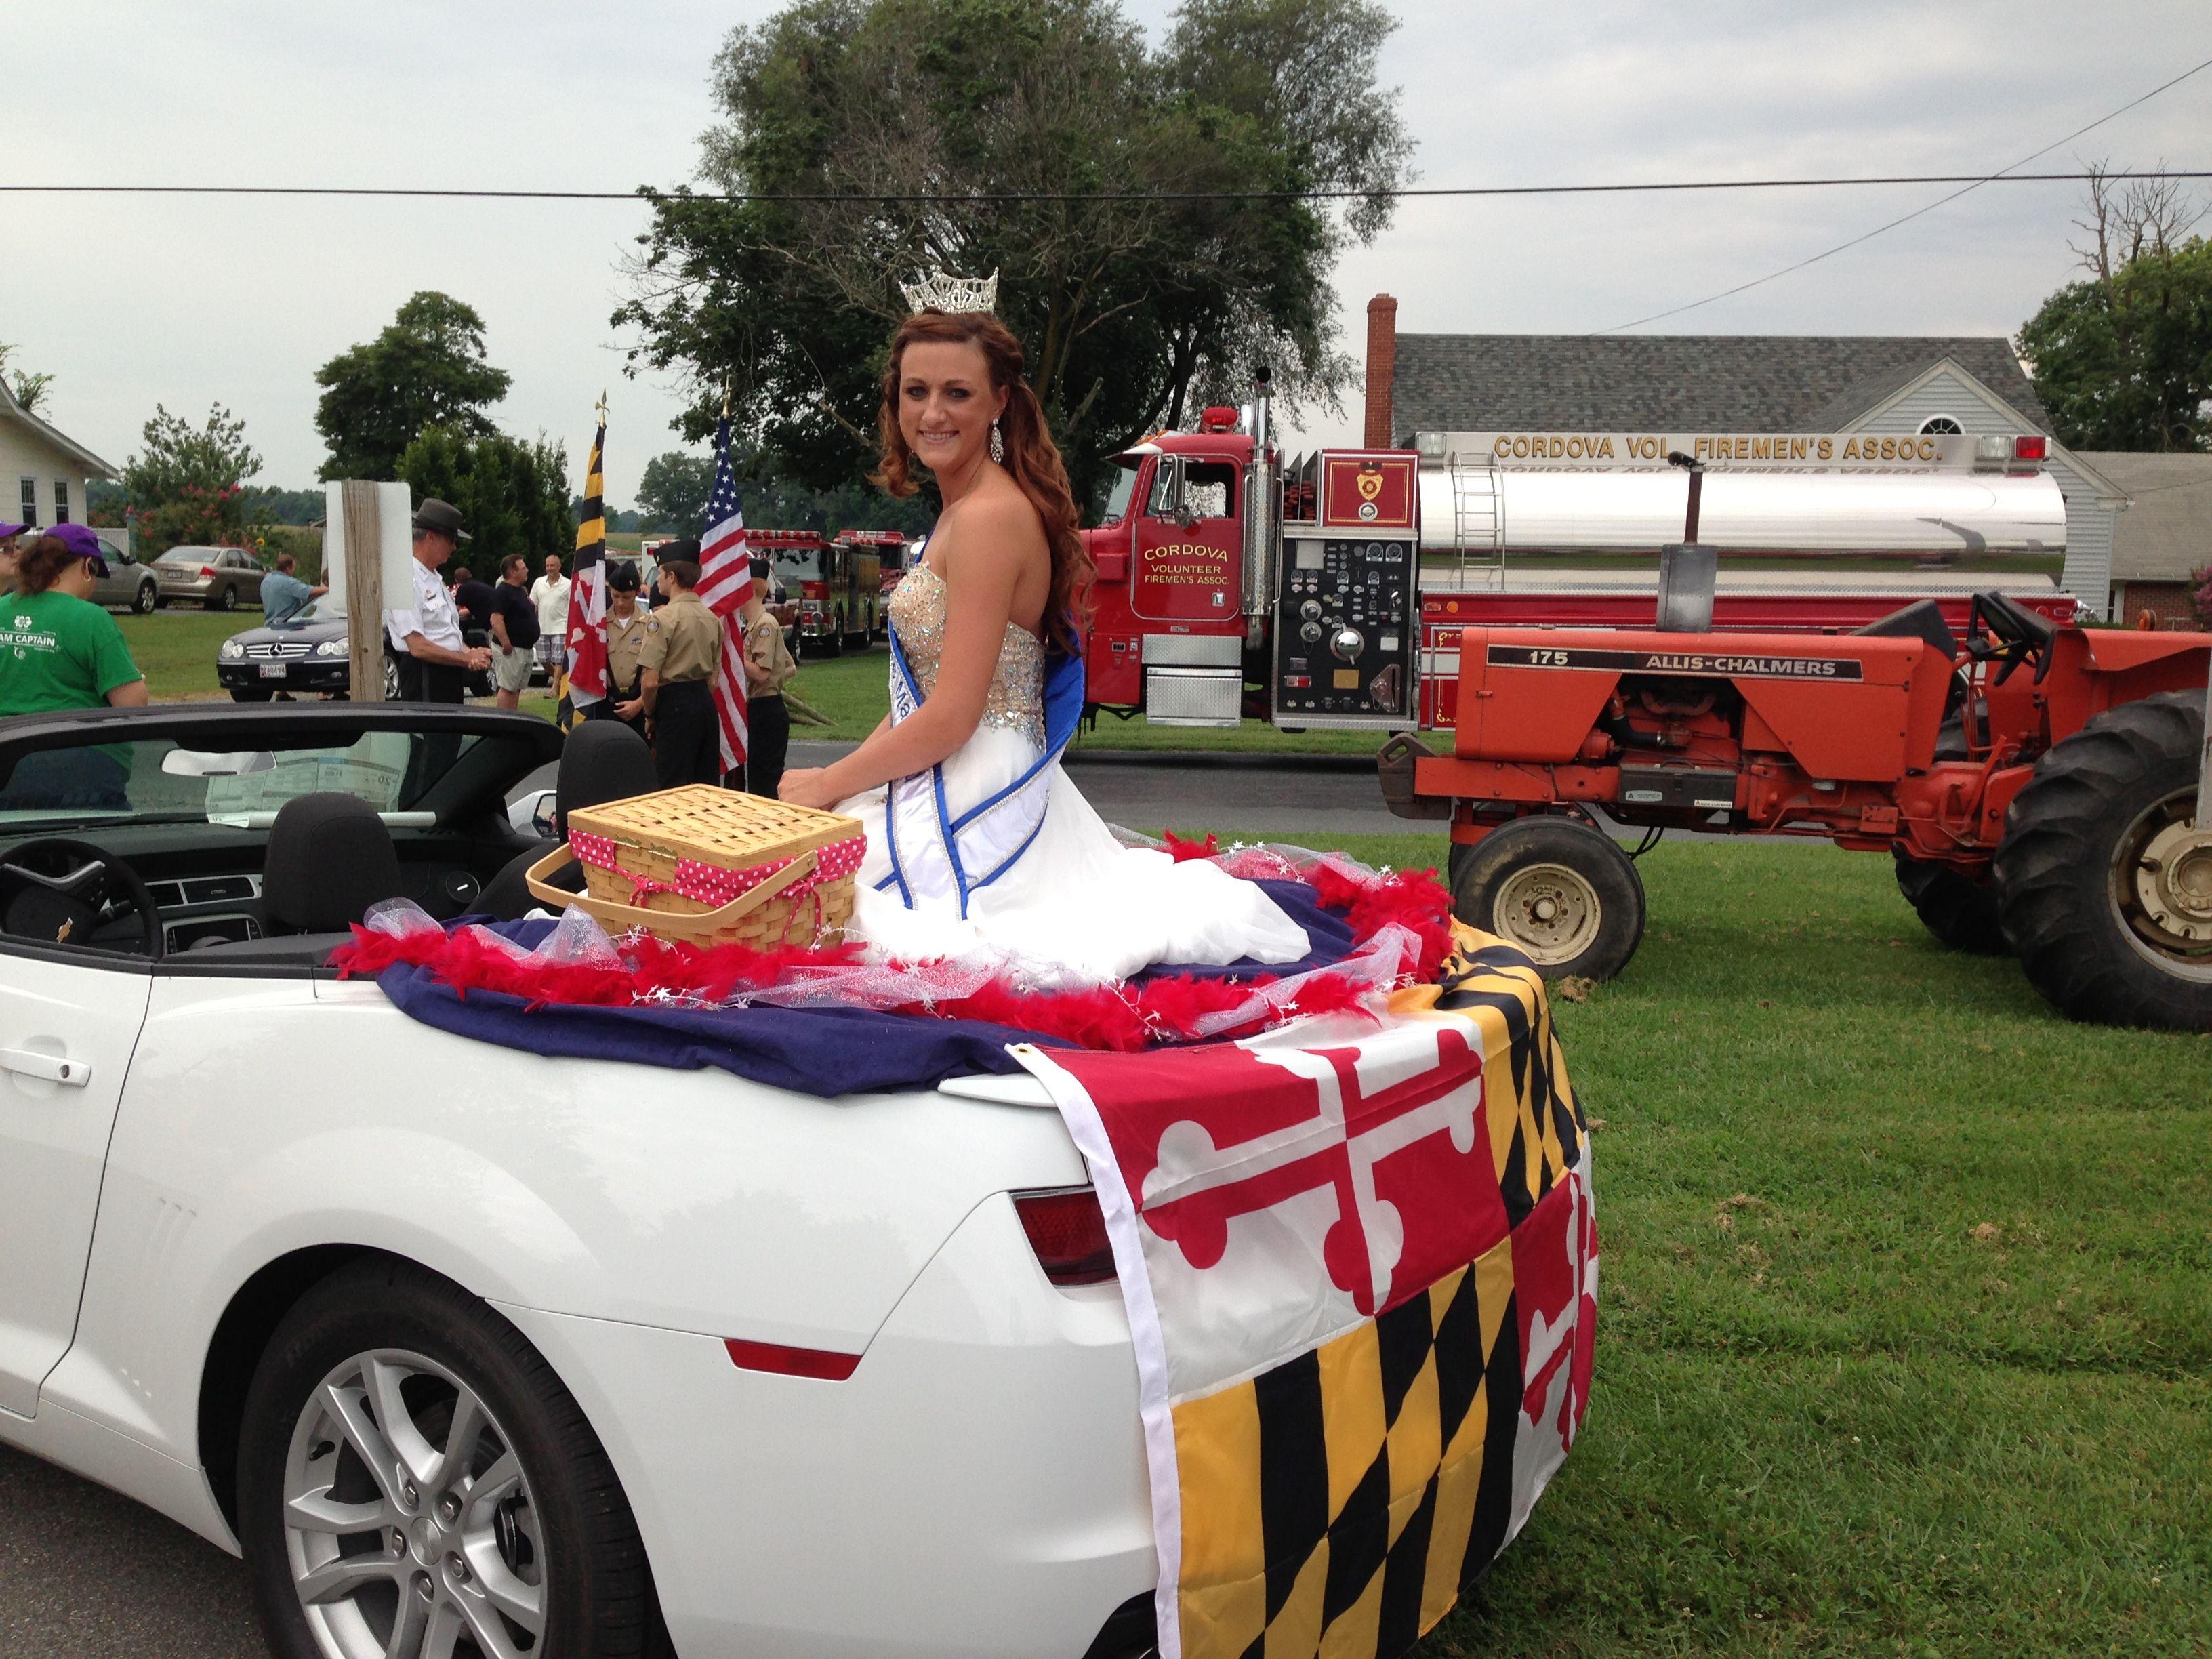 miss maryland queen parade car idea - Christmas Car Parade Decorations